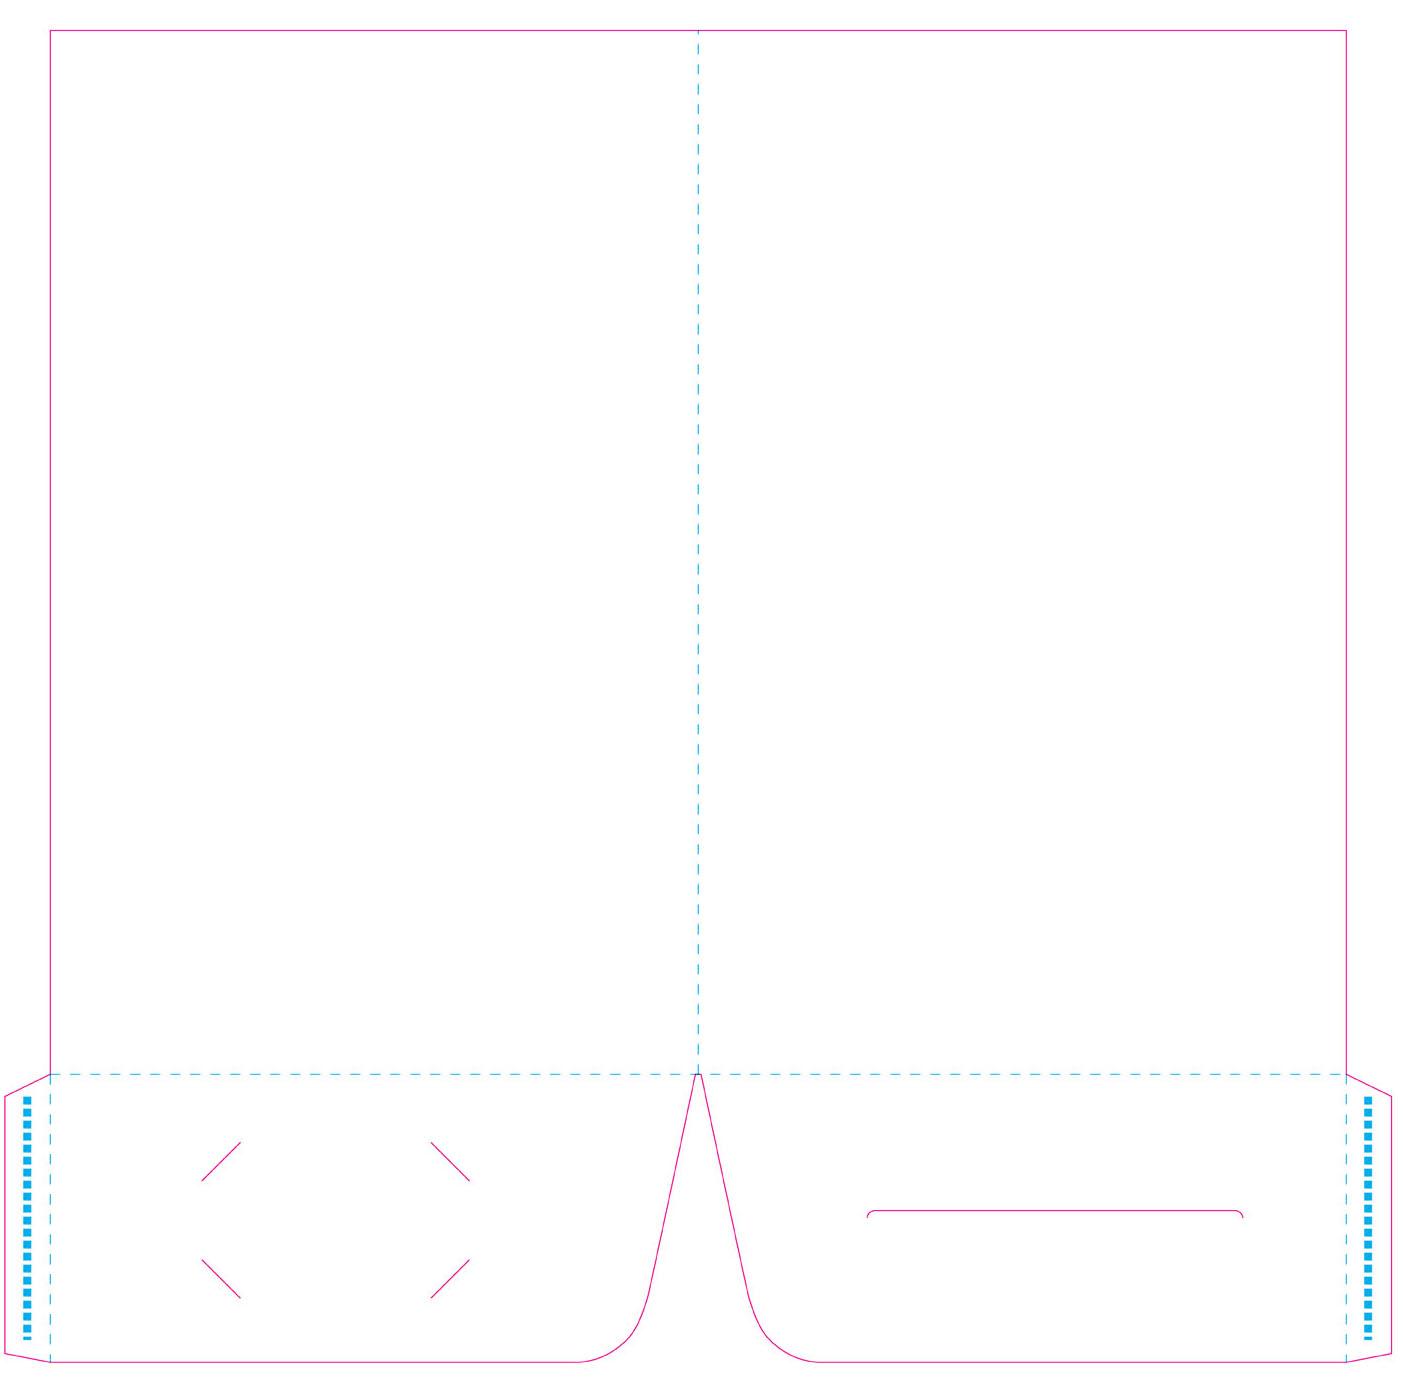 alfa img showing legal file folder design template